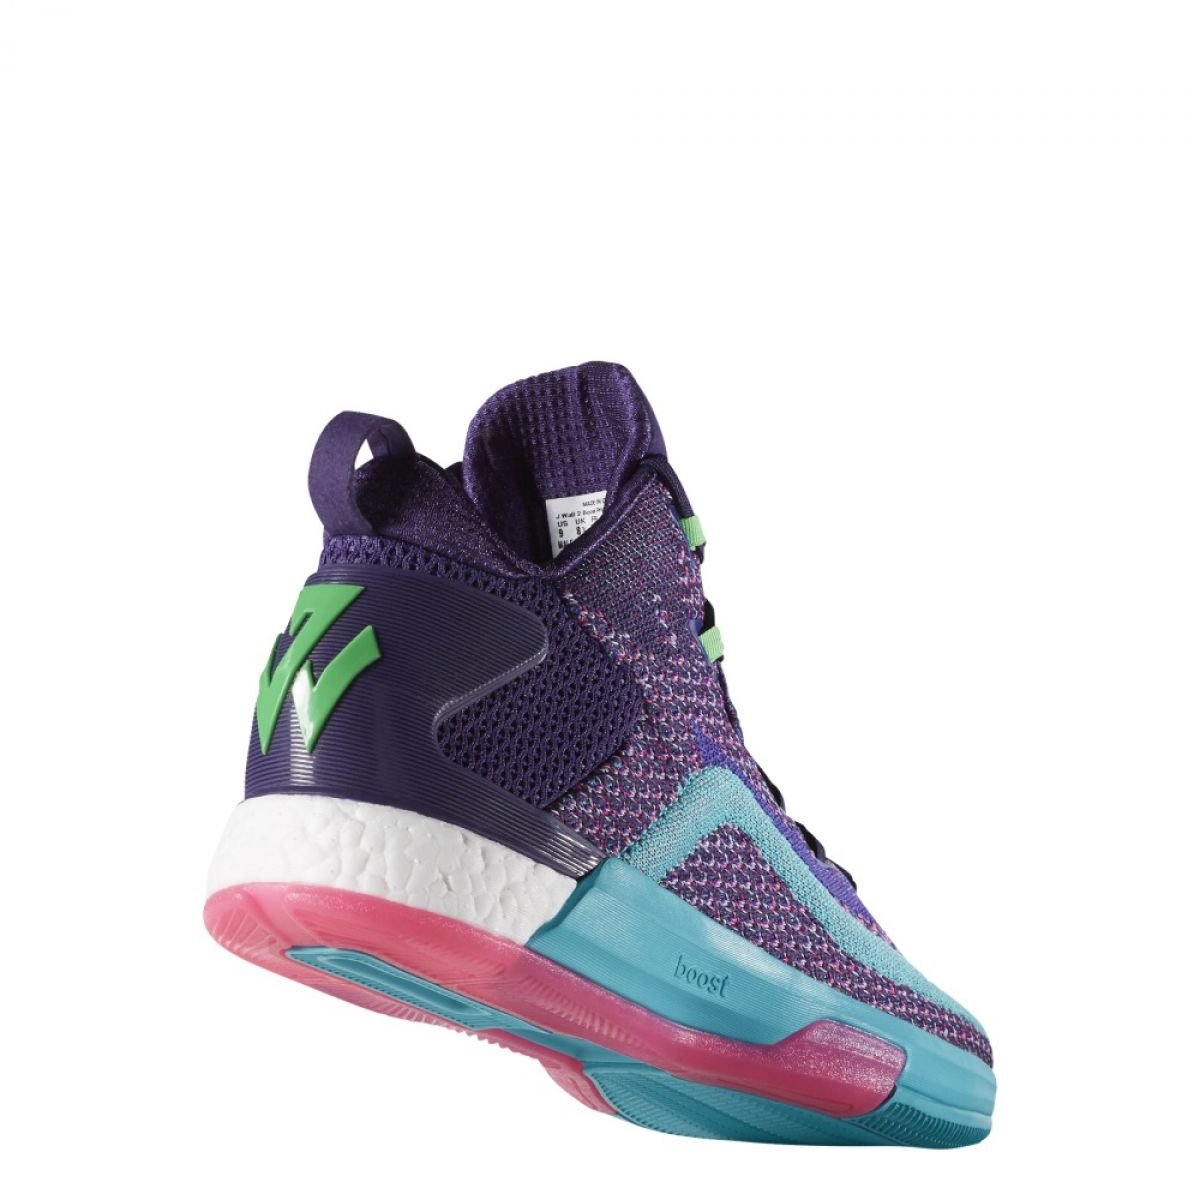 3fc9ced24dcc ... get buty adidas john wall 2 boost d70028 45 1 3 7136129947 bcfb6 77ba7